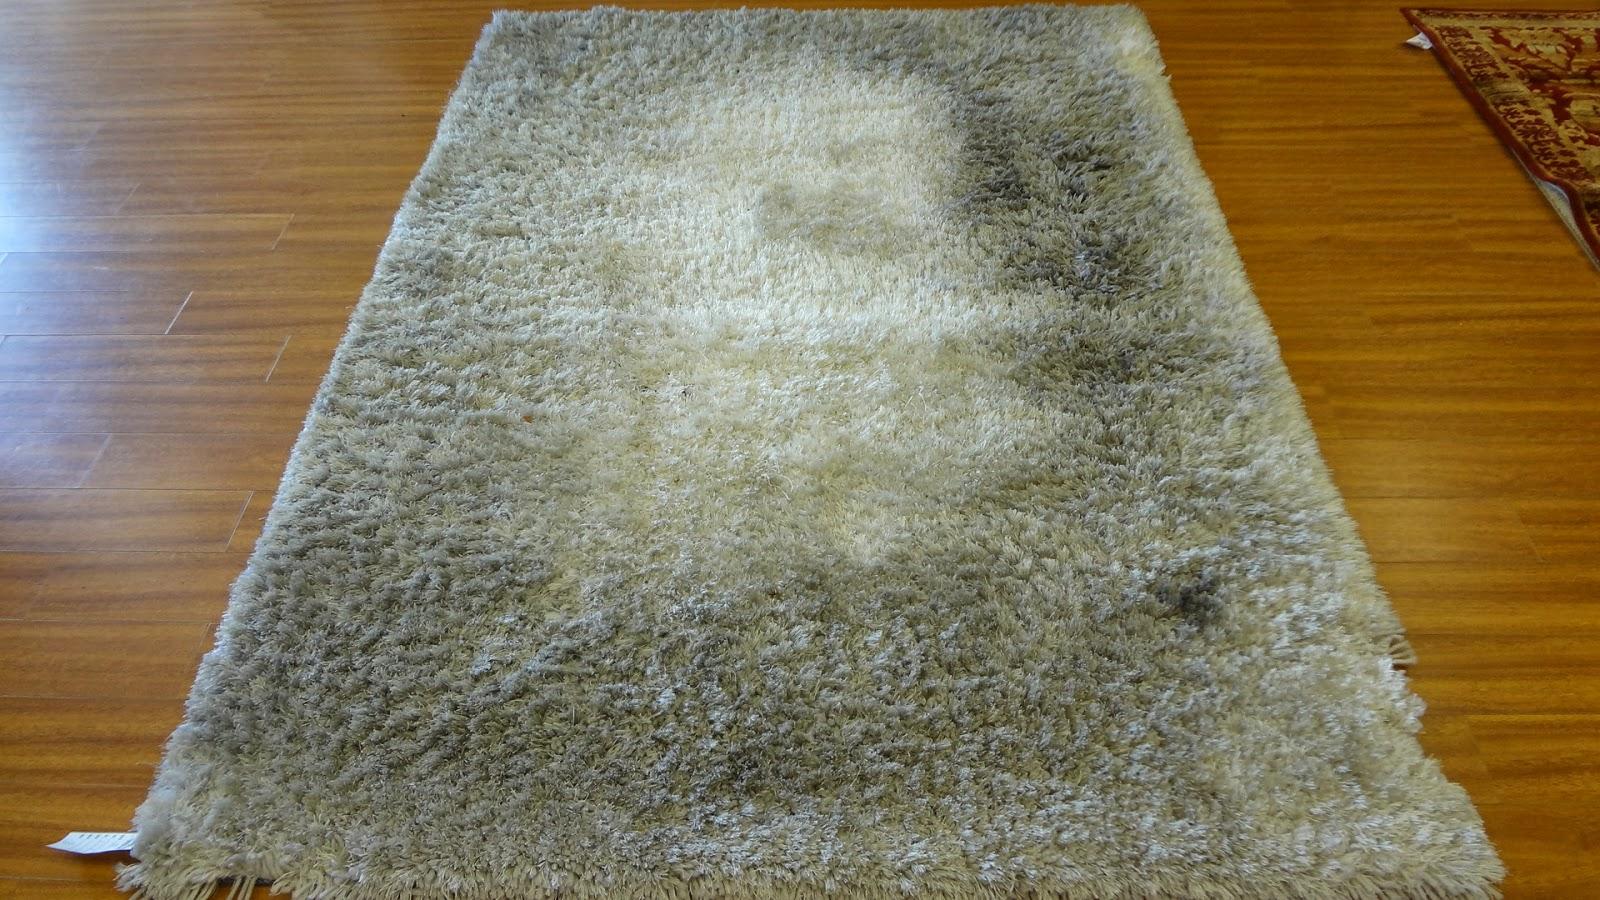 Rug Master: Shag Rug, Shag Carpet Cleaning in Los Angeles